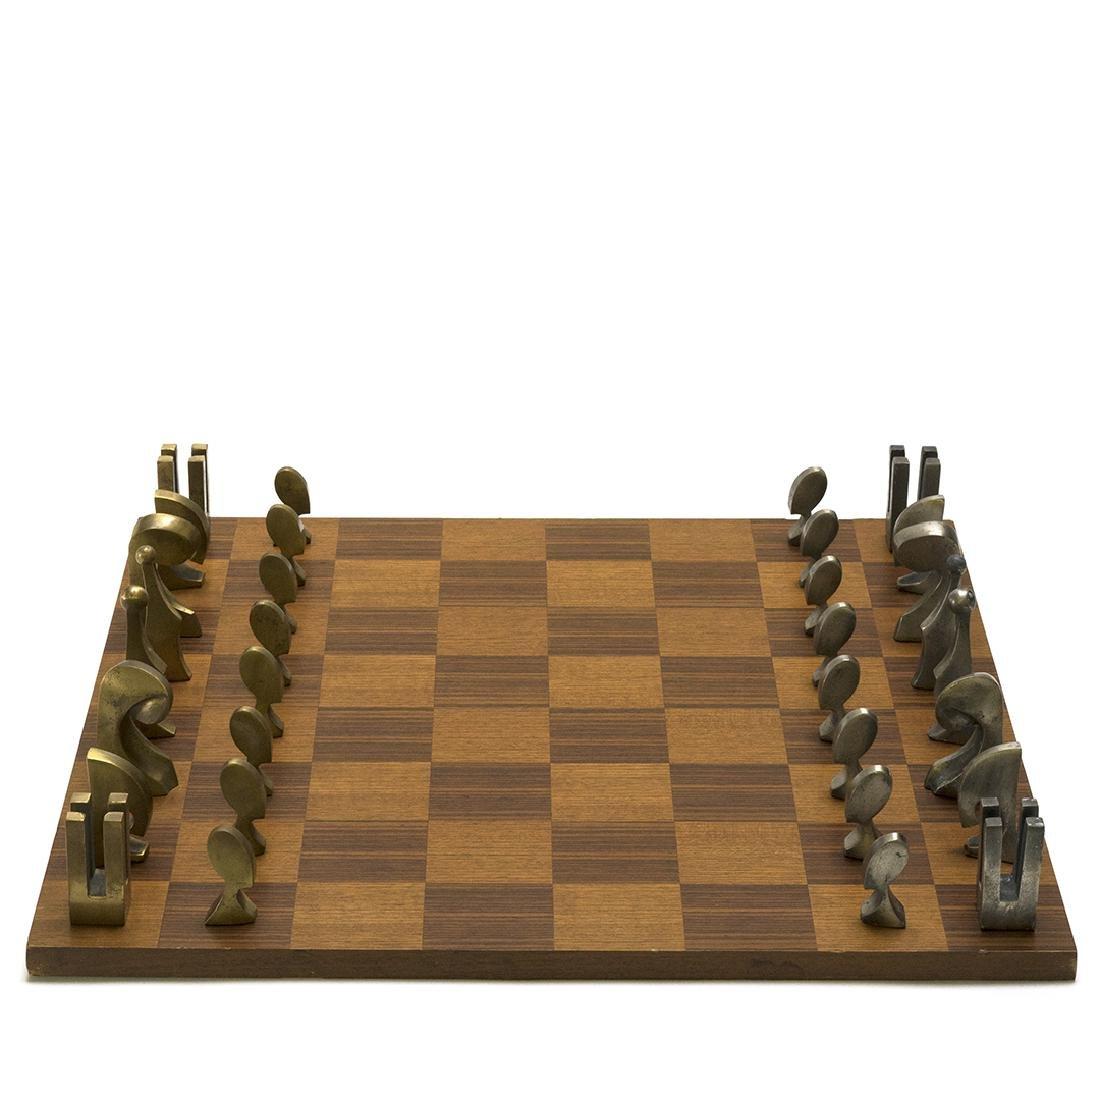 Pierre Cardin Evolution chess set - 3